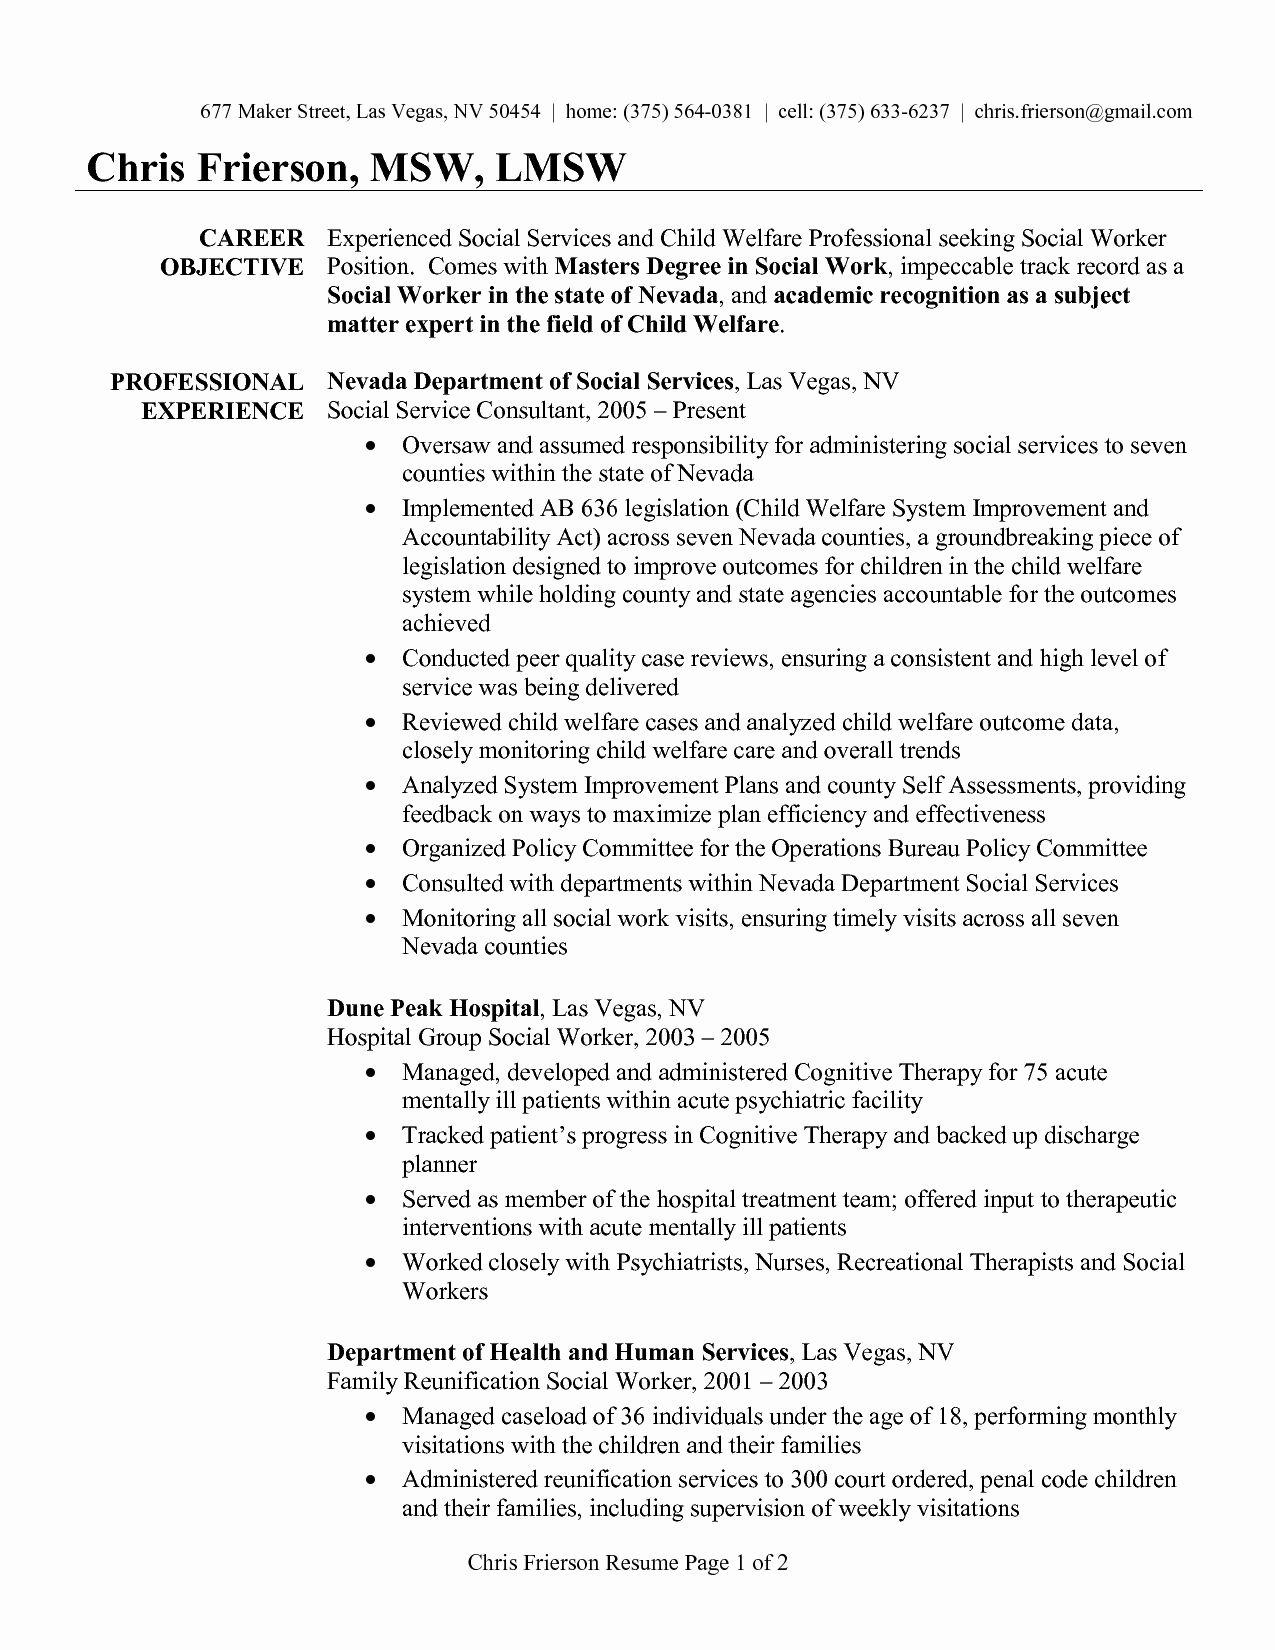 23 social Work Resume Example in 2020